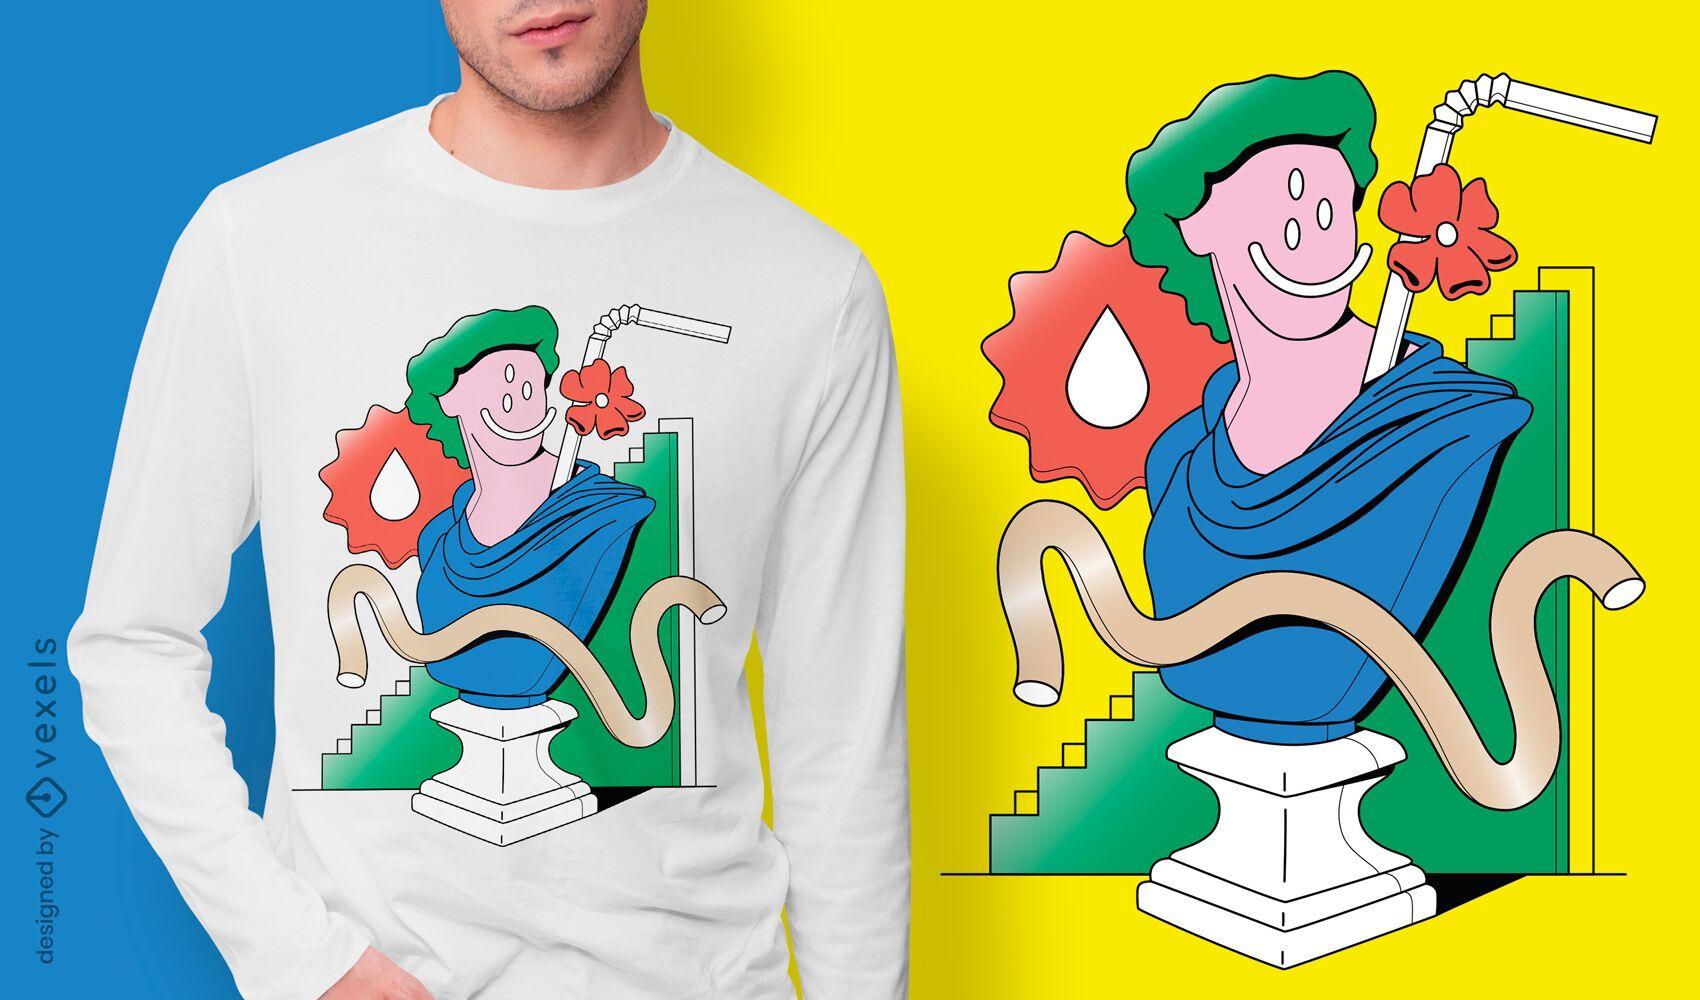 Surreal sculpture t-shirt design